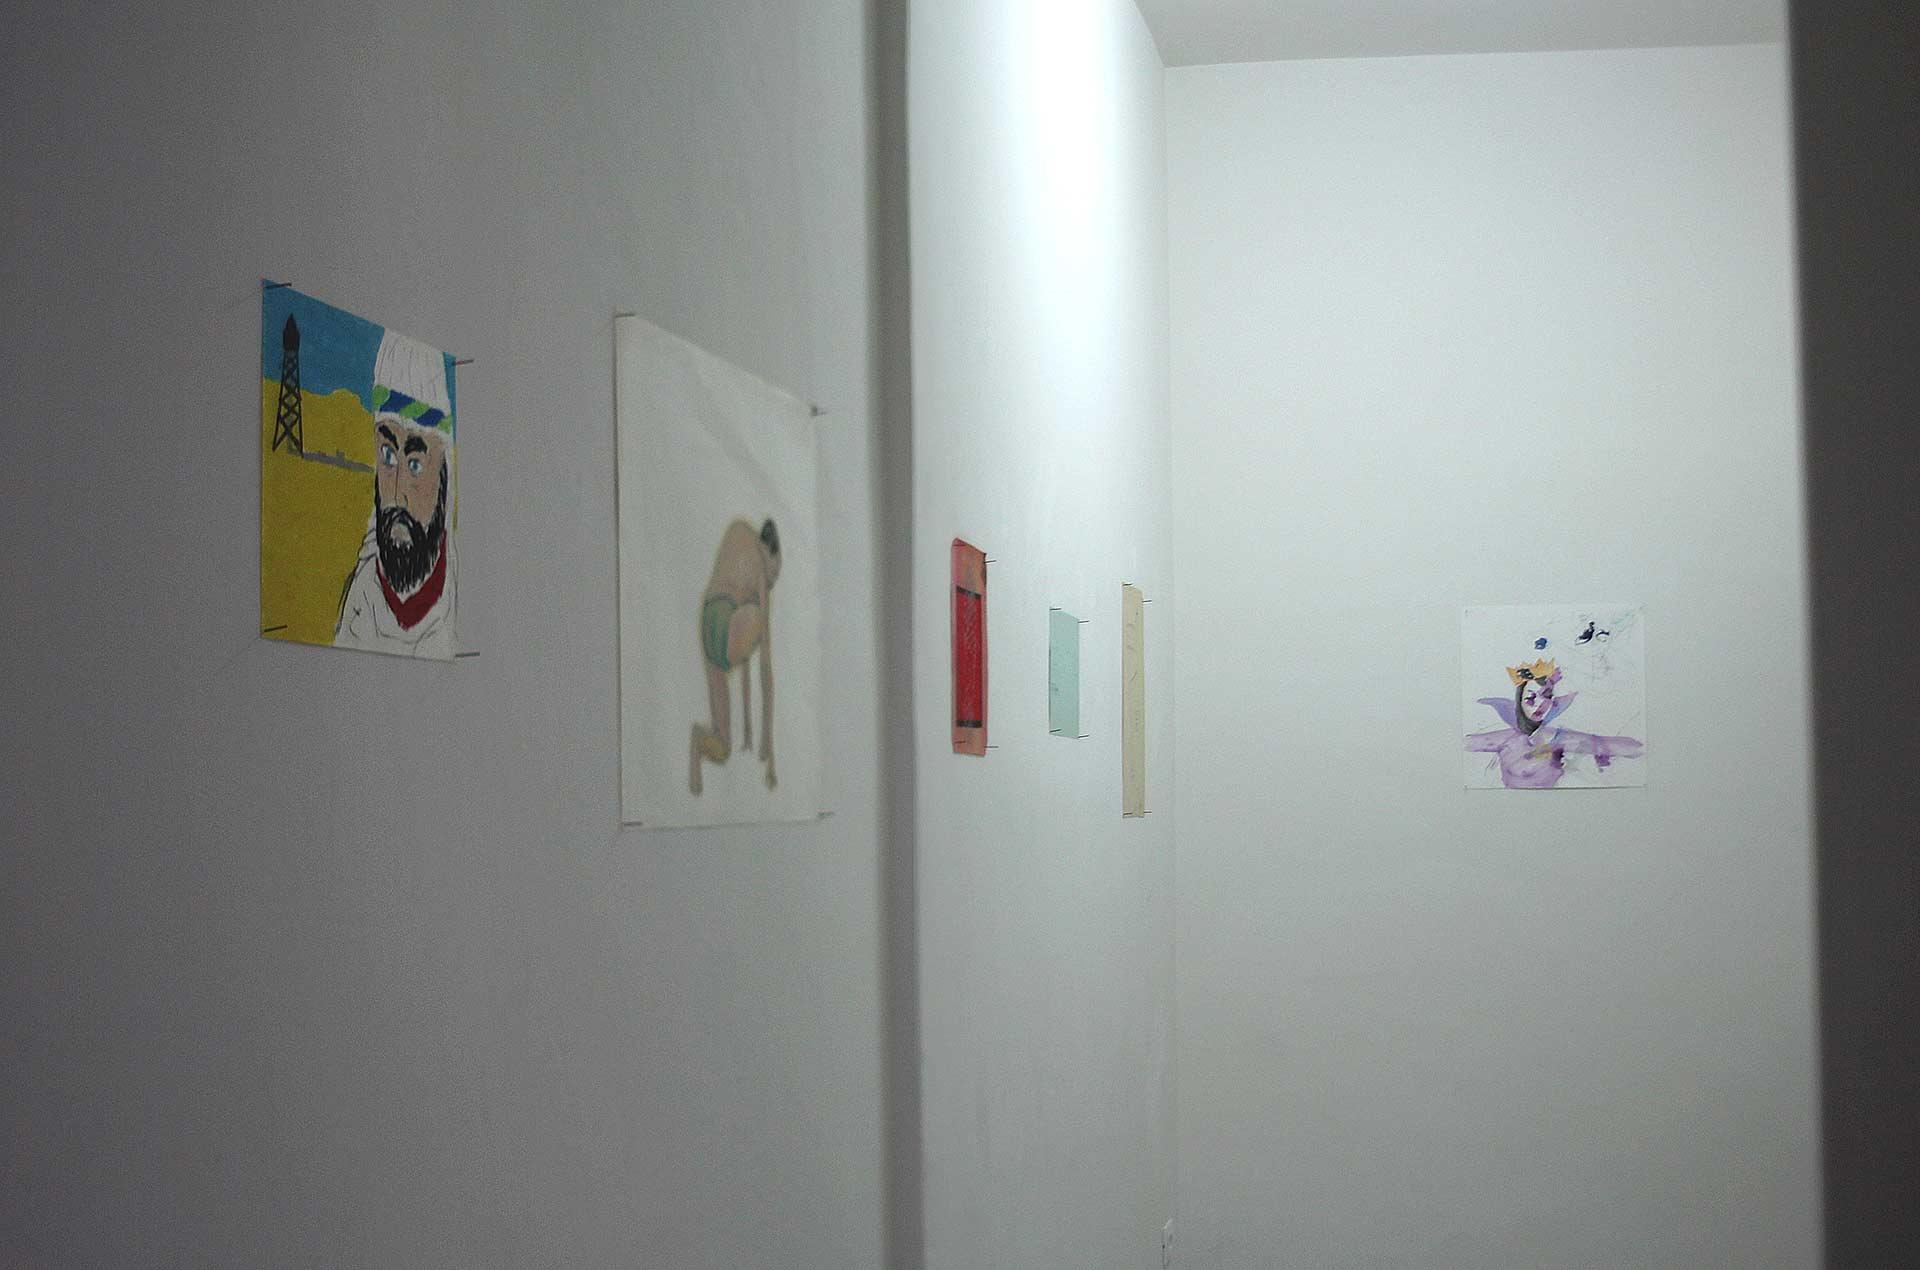 FrighteningFigure_2012-Gabinetto_Disegni